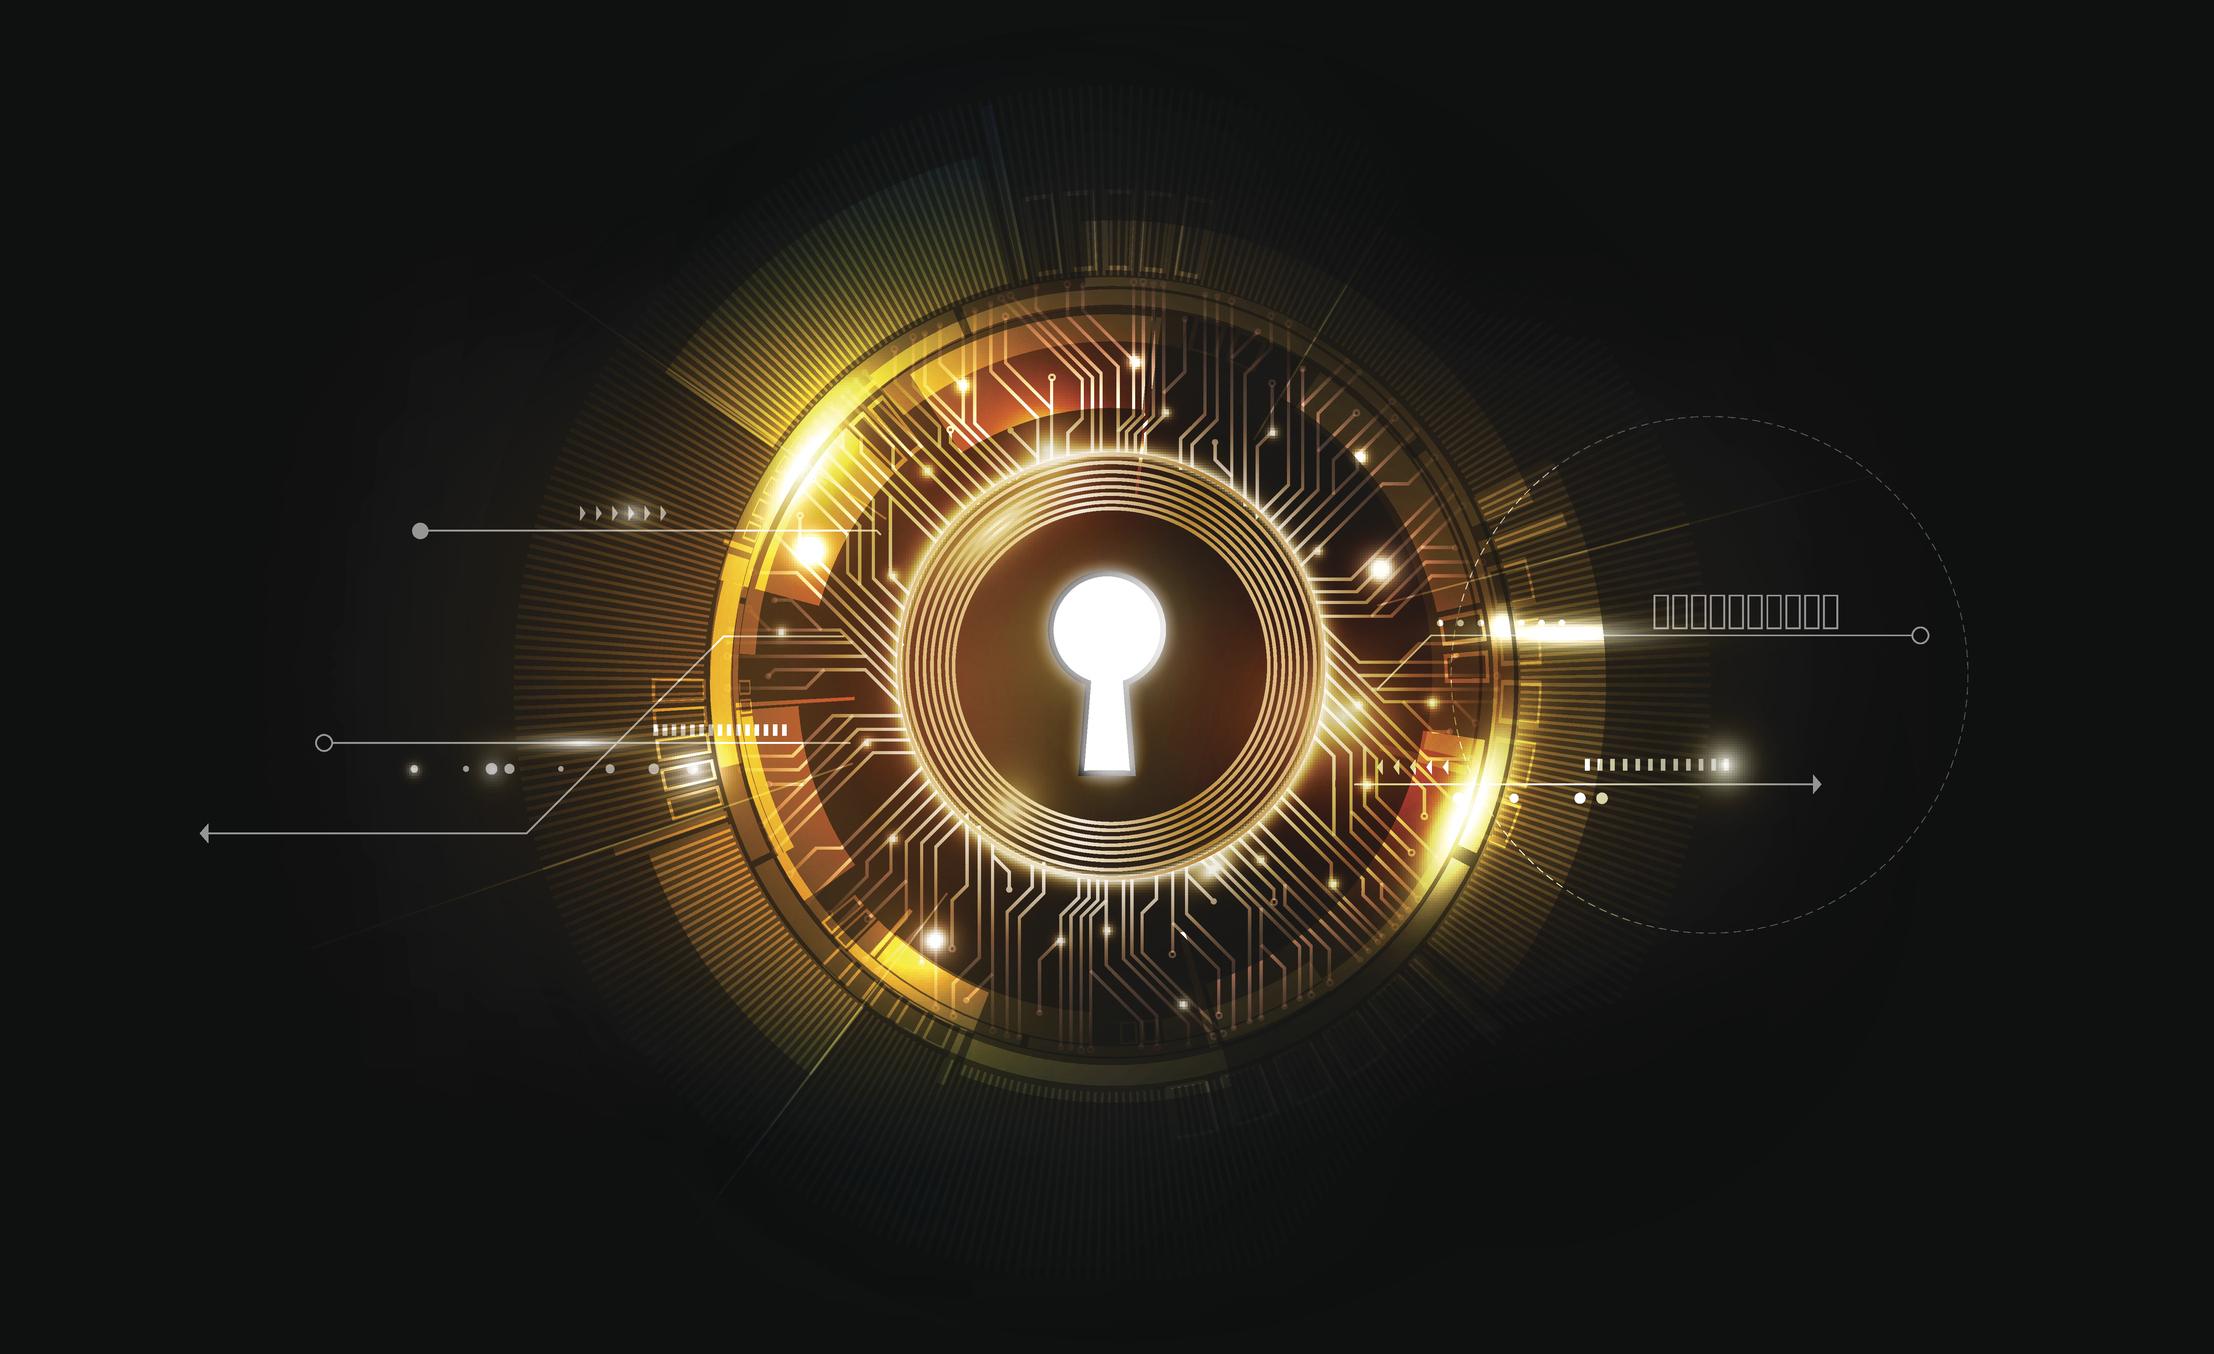 auからUQモバイル口座振替へ乗り換えるためのSIMフリー